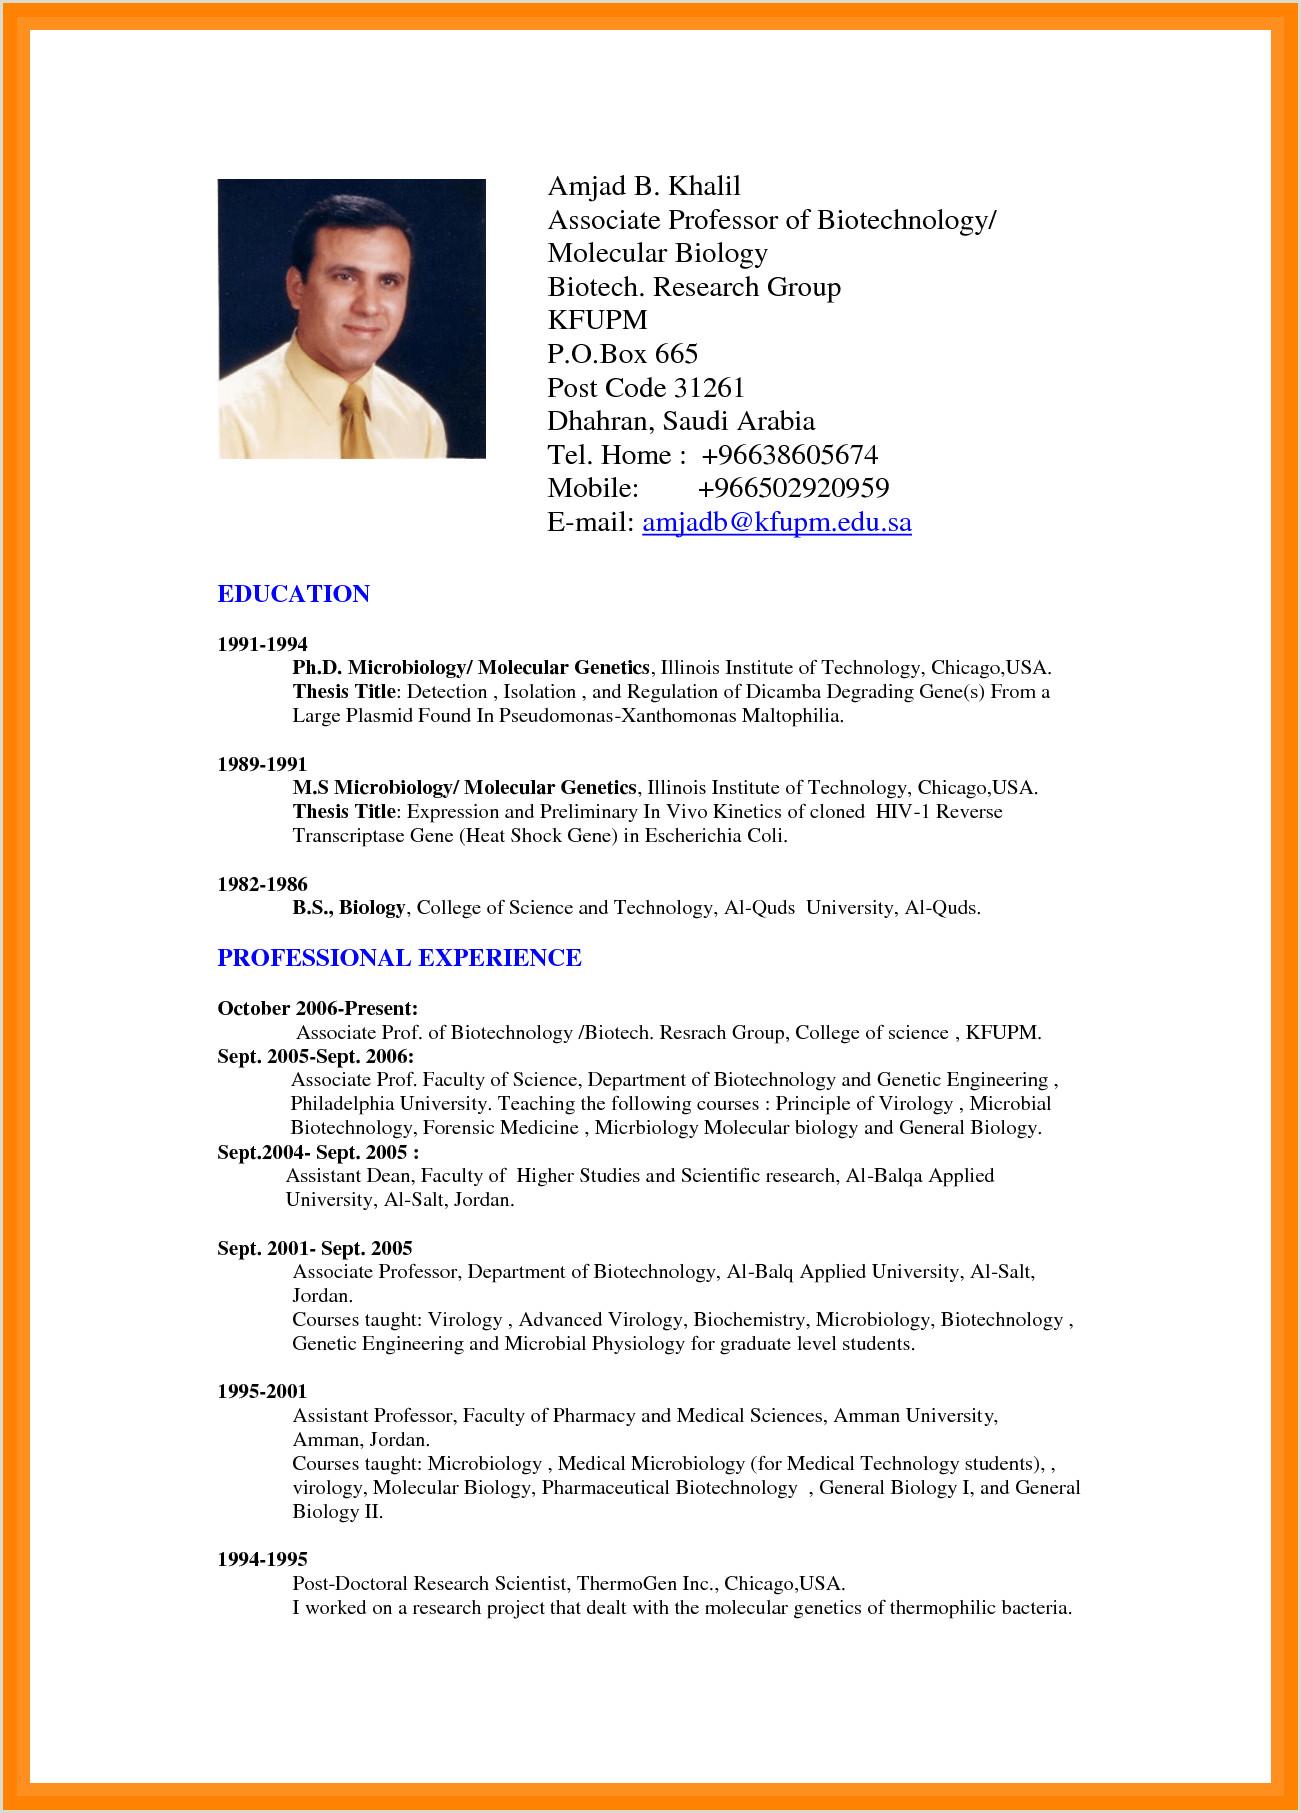 Standard Cv format for Teaching Profession Brilliant Ideas 9 Cv Sample Doc Charming Resume format